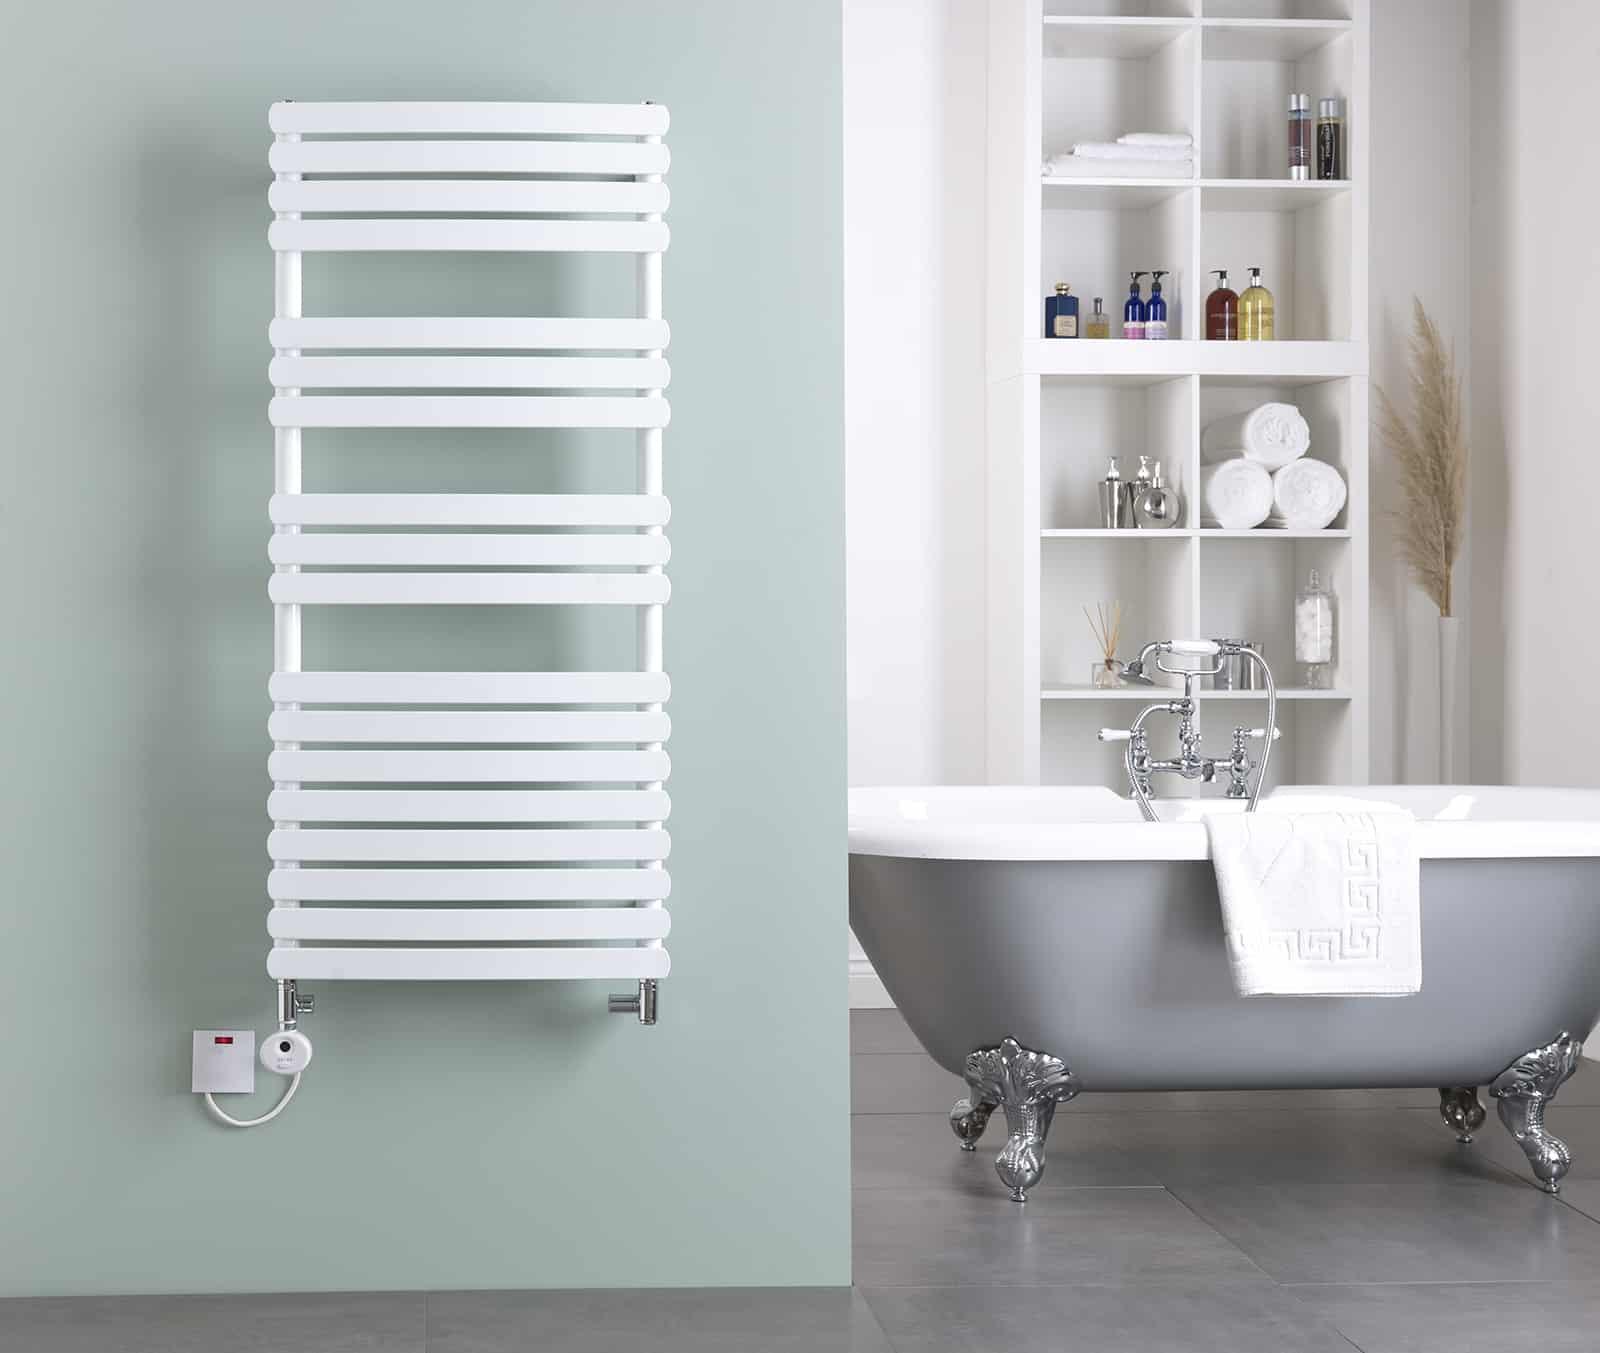 Greeba Chrome Heated Towel Rail: GREEBA Flat Tube Heated Towel Rail / Warmer, Chrome